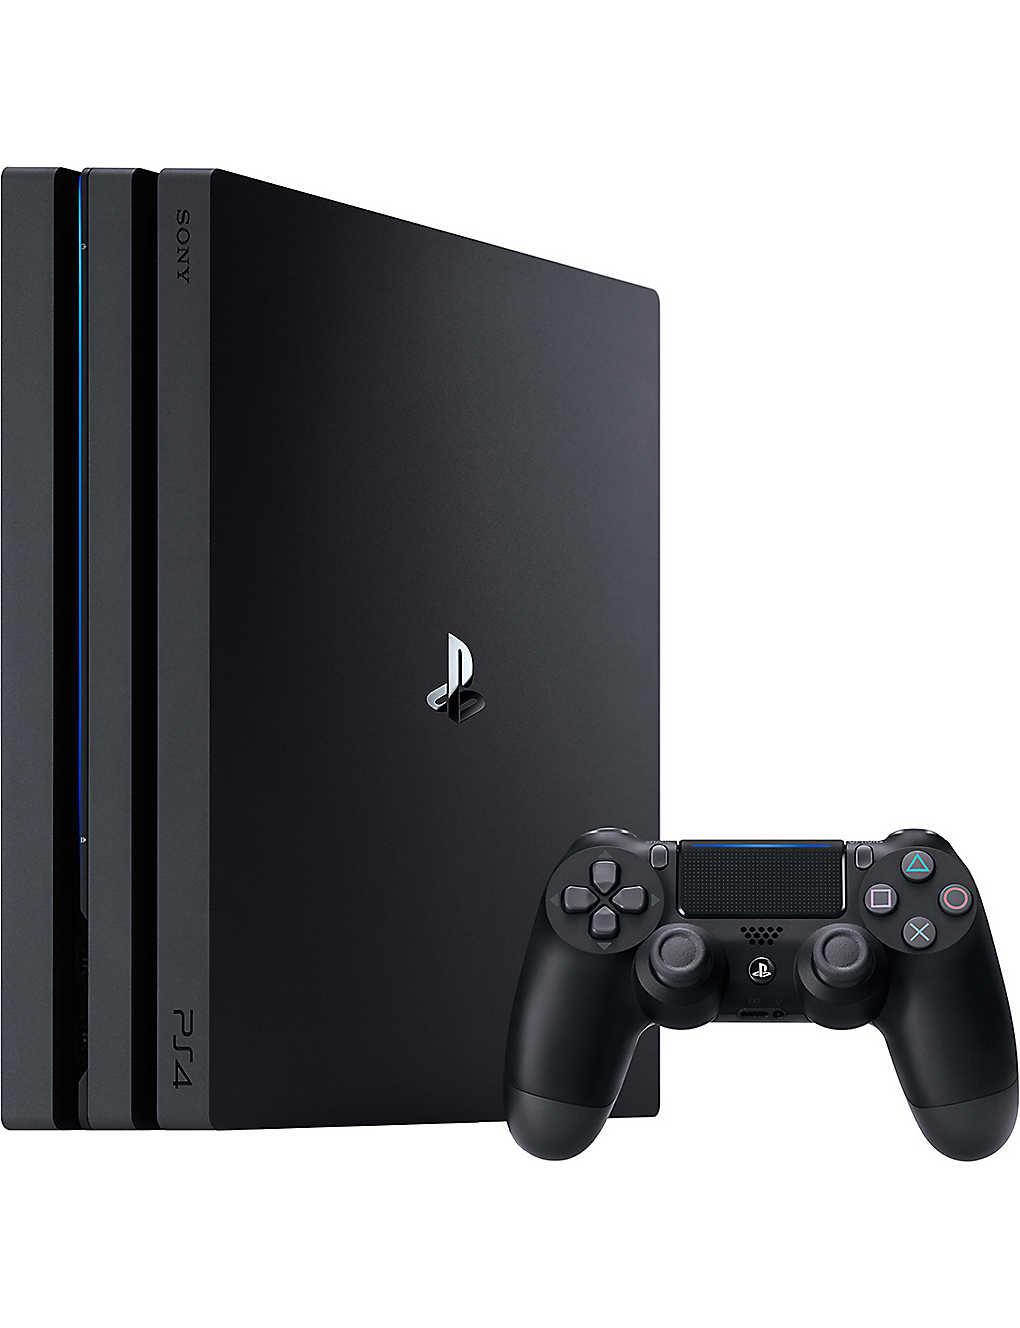 fb8ae2e683c SONY - Playstation 4 pro console | Selfridges.com